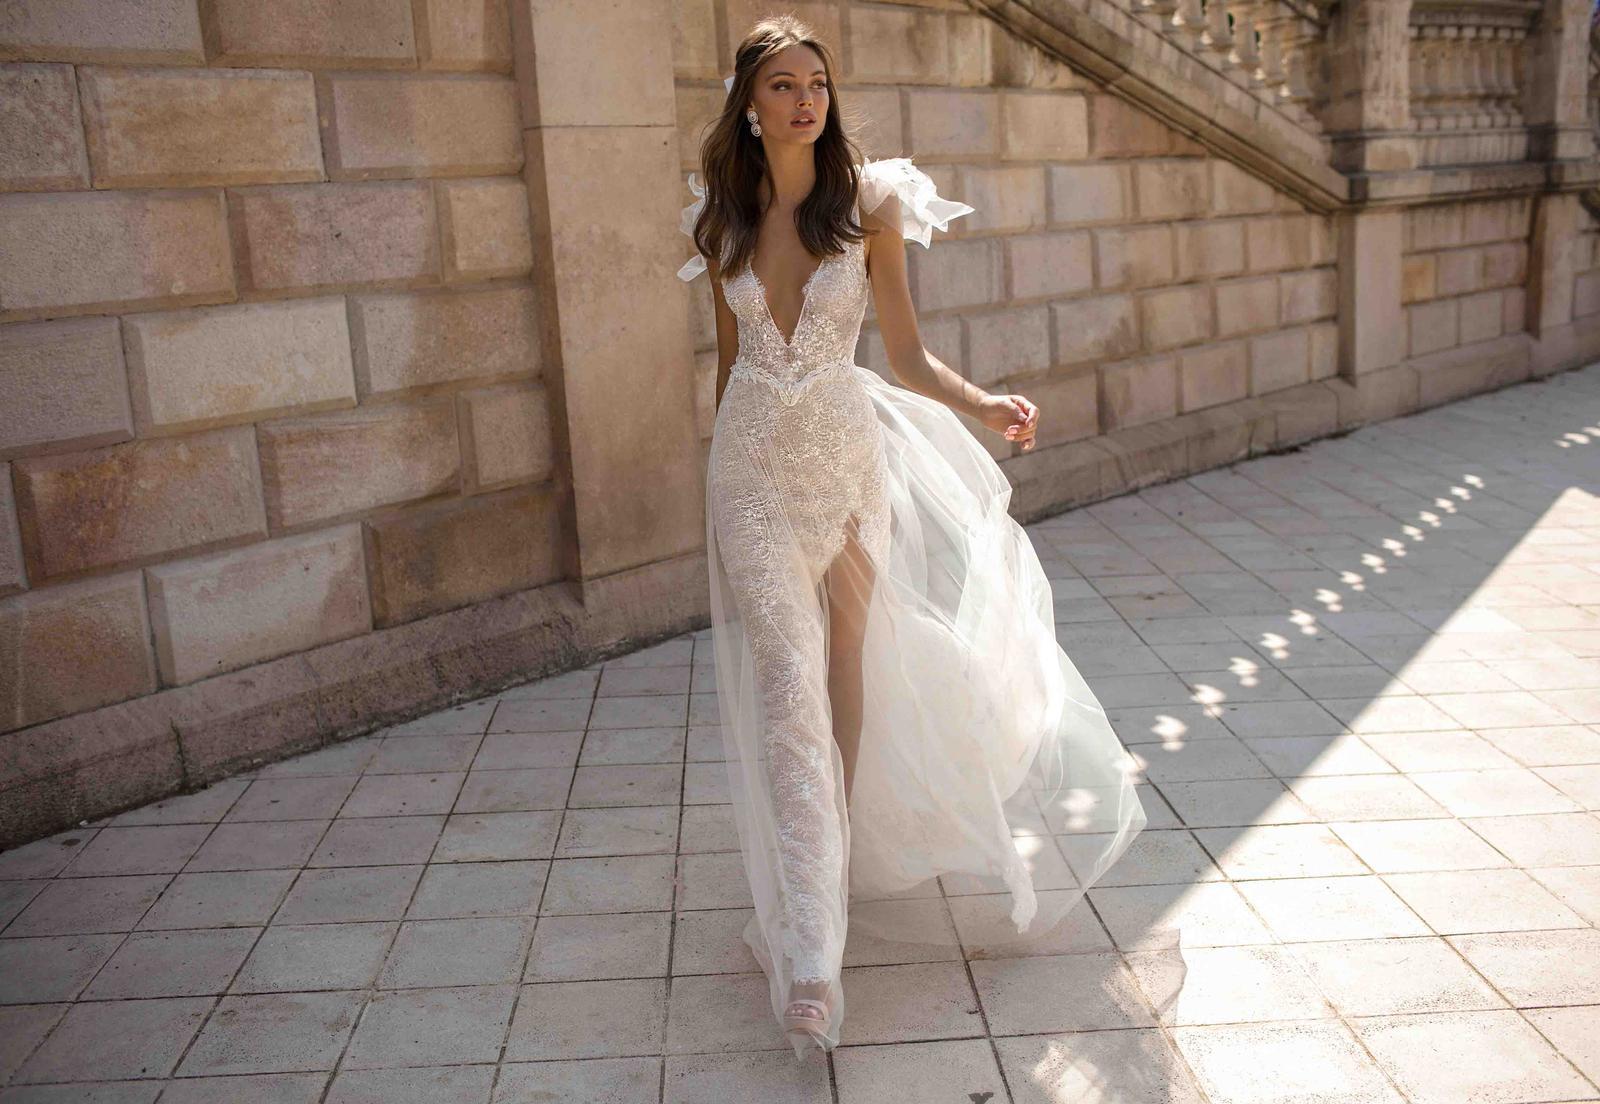 Muse by Berta * Svadobné šaty z kolekcií na rok 2019 - Obrázok č. 37